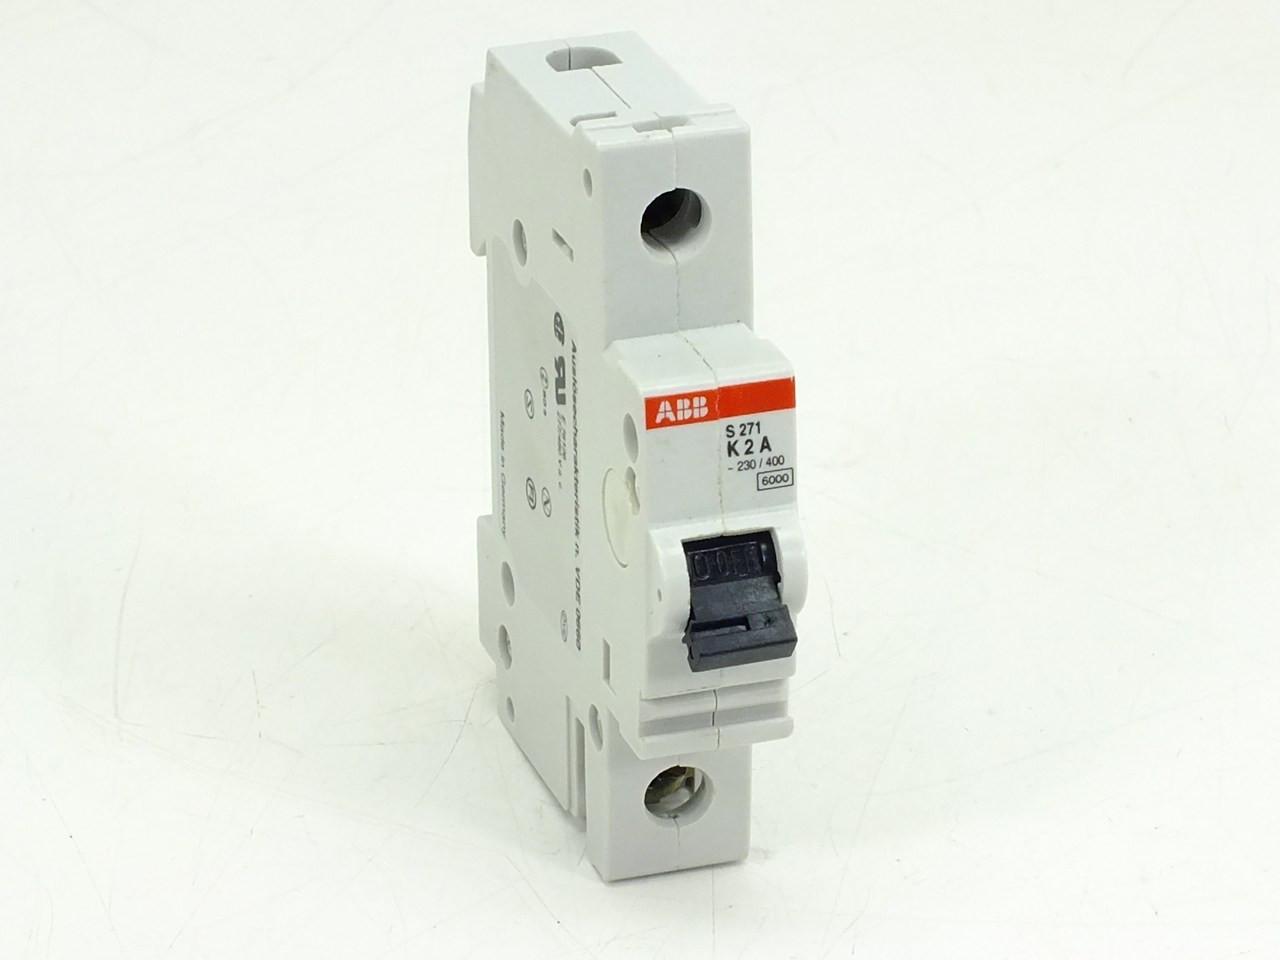 Abb S271 K2a Circuit Breaker 2amp 1pole 277 480vac